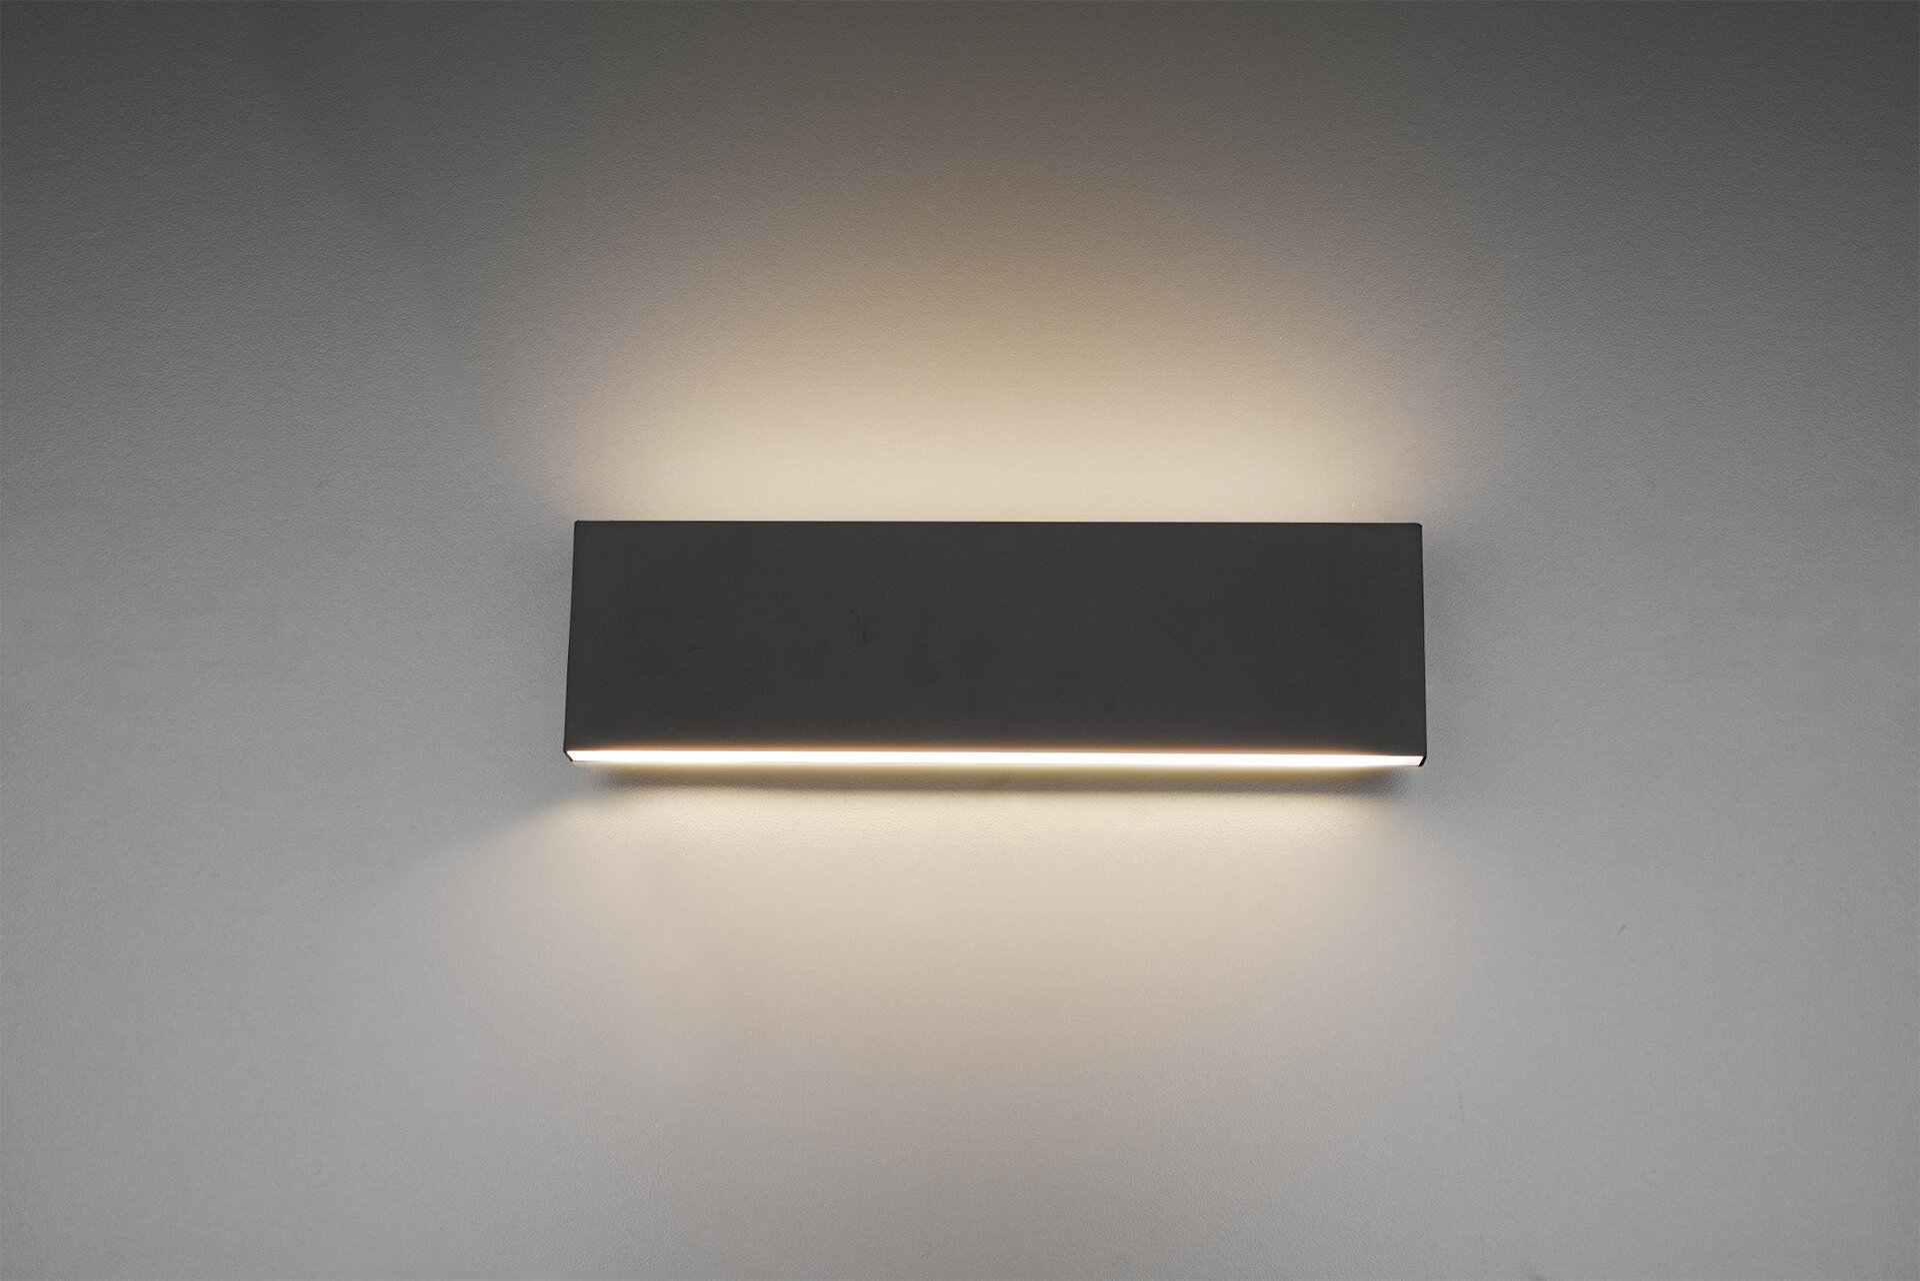 Wandleuchte Concha Trio Leuchten Metall 5 x 8 x 28 cm